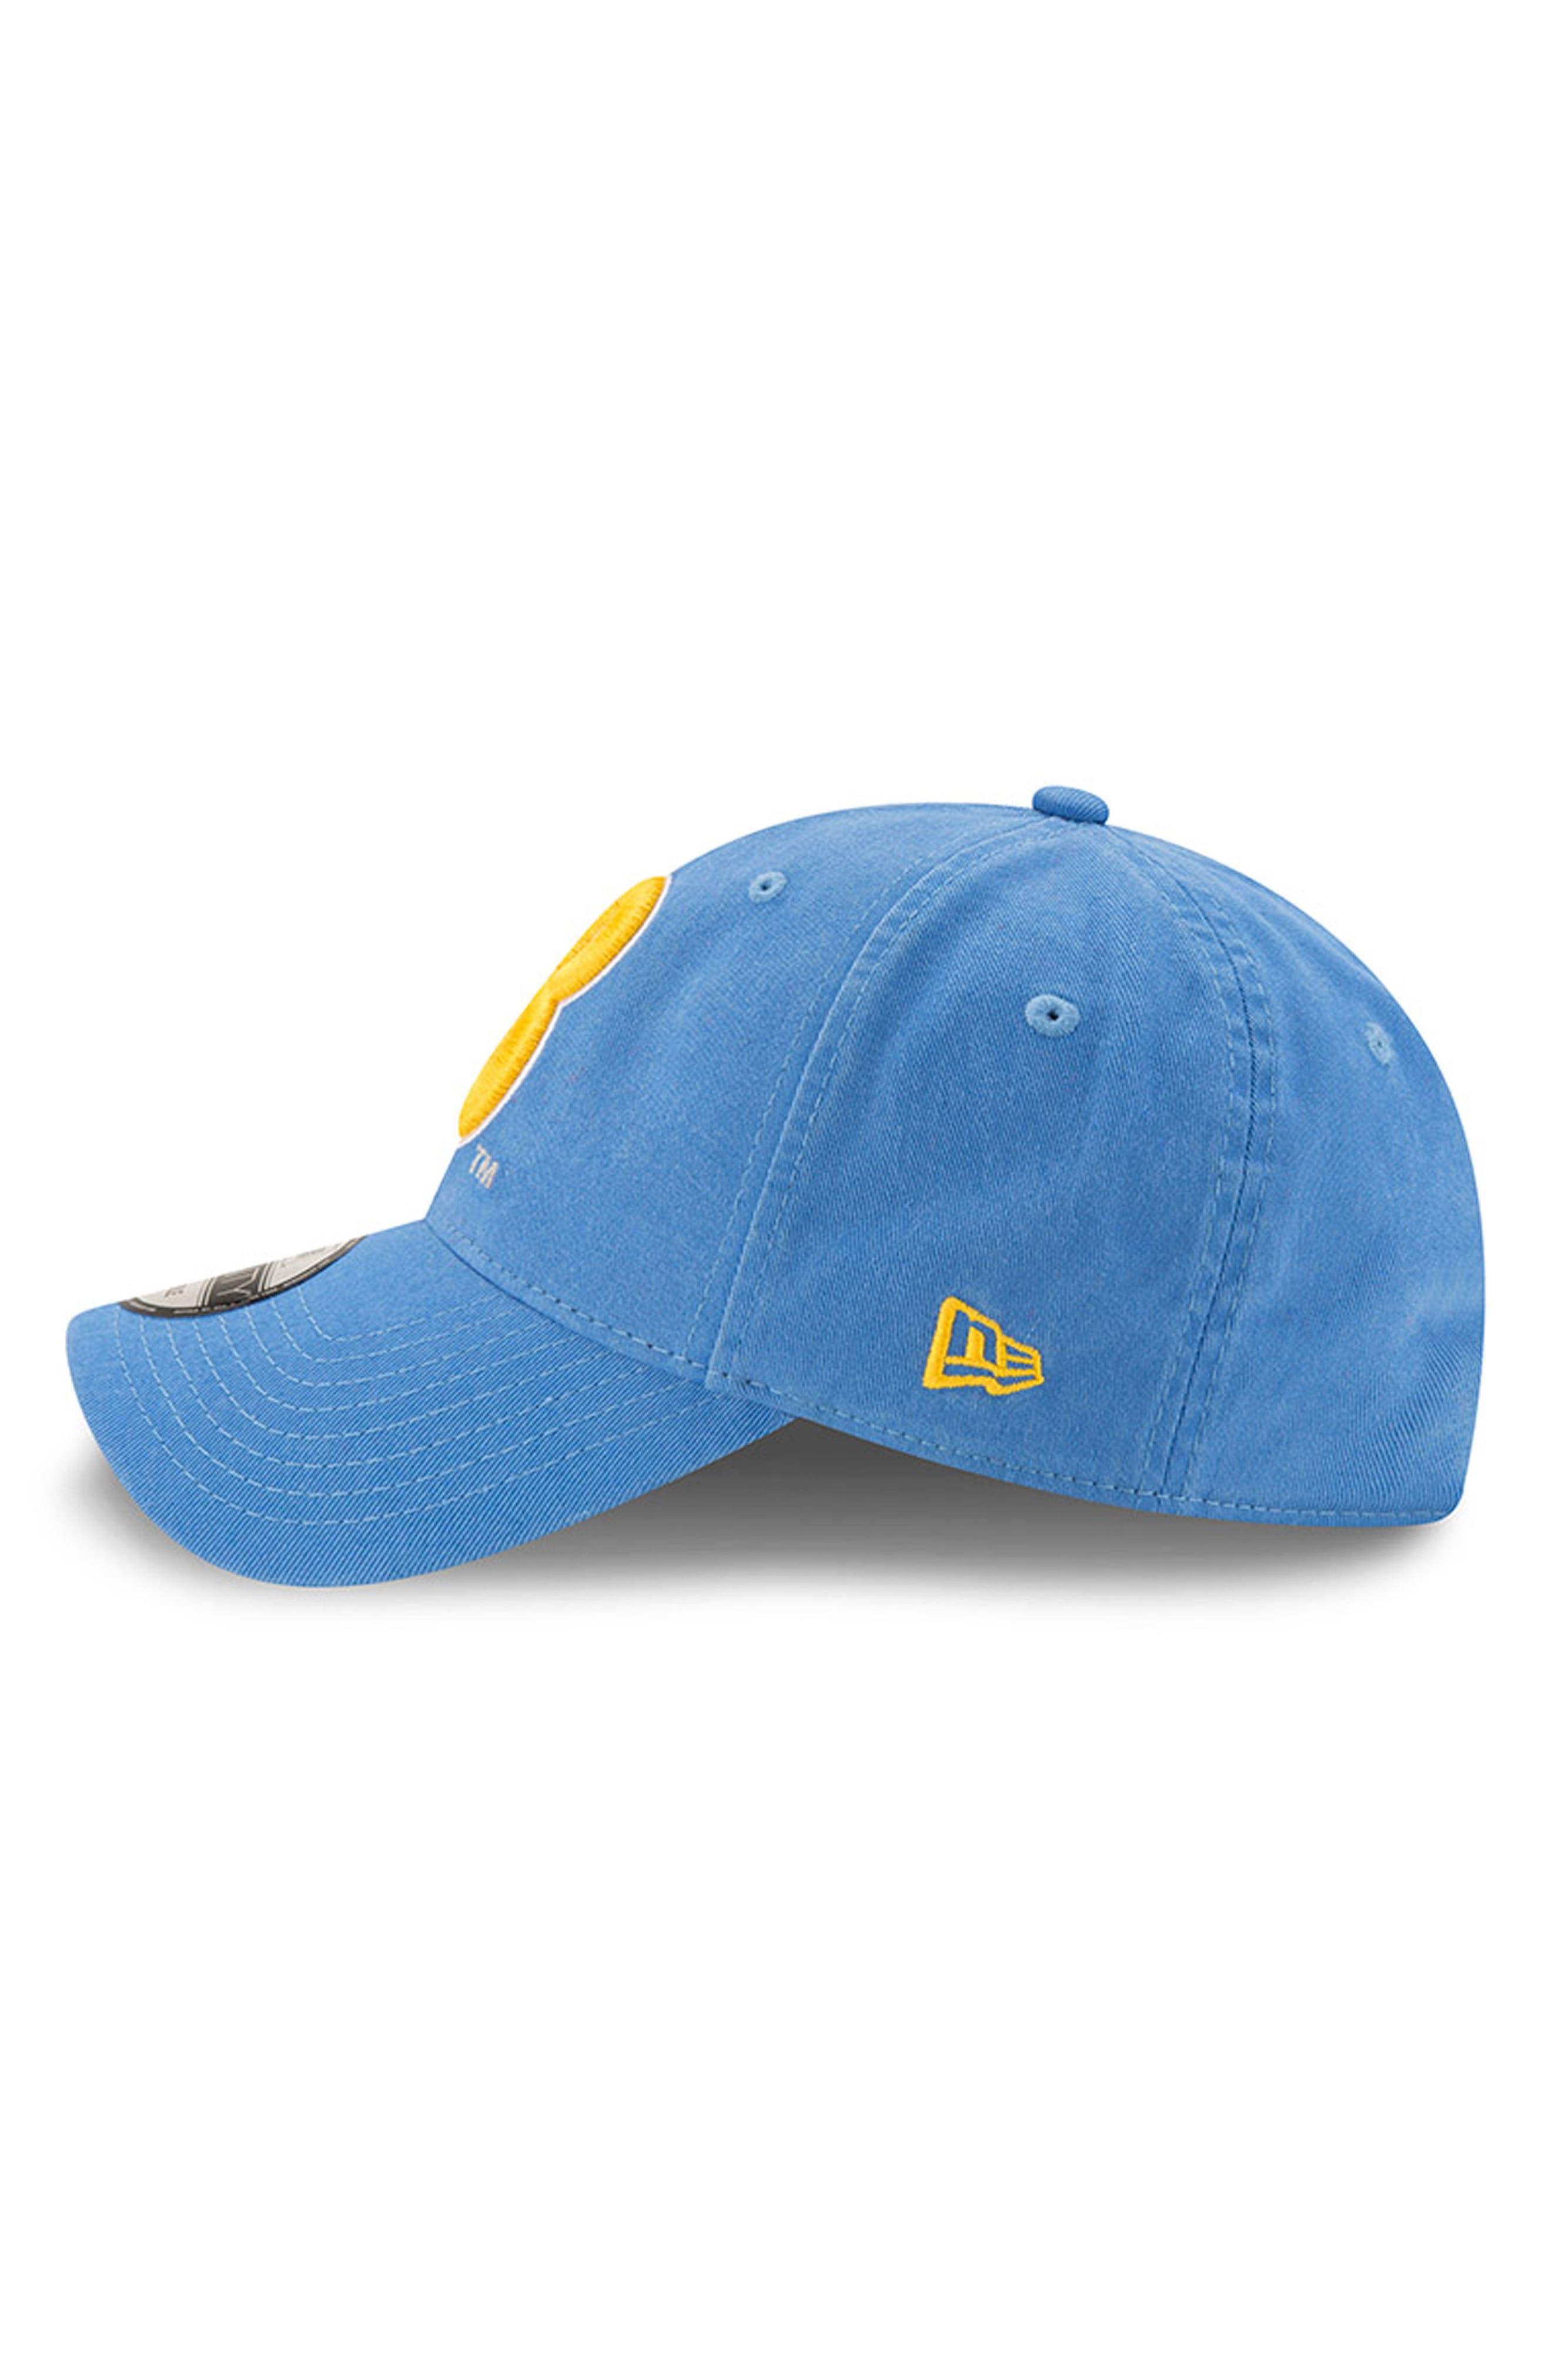 New Era Collegiate Core Classic - UCLA Bruins Baseball Cap,                             Alternate thumbnail 5, color,                             420